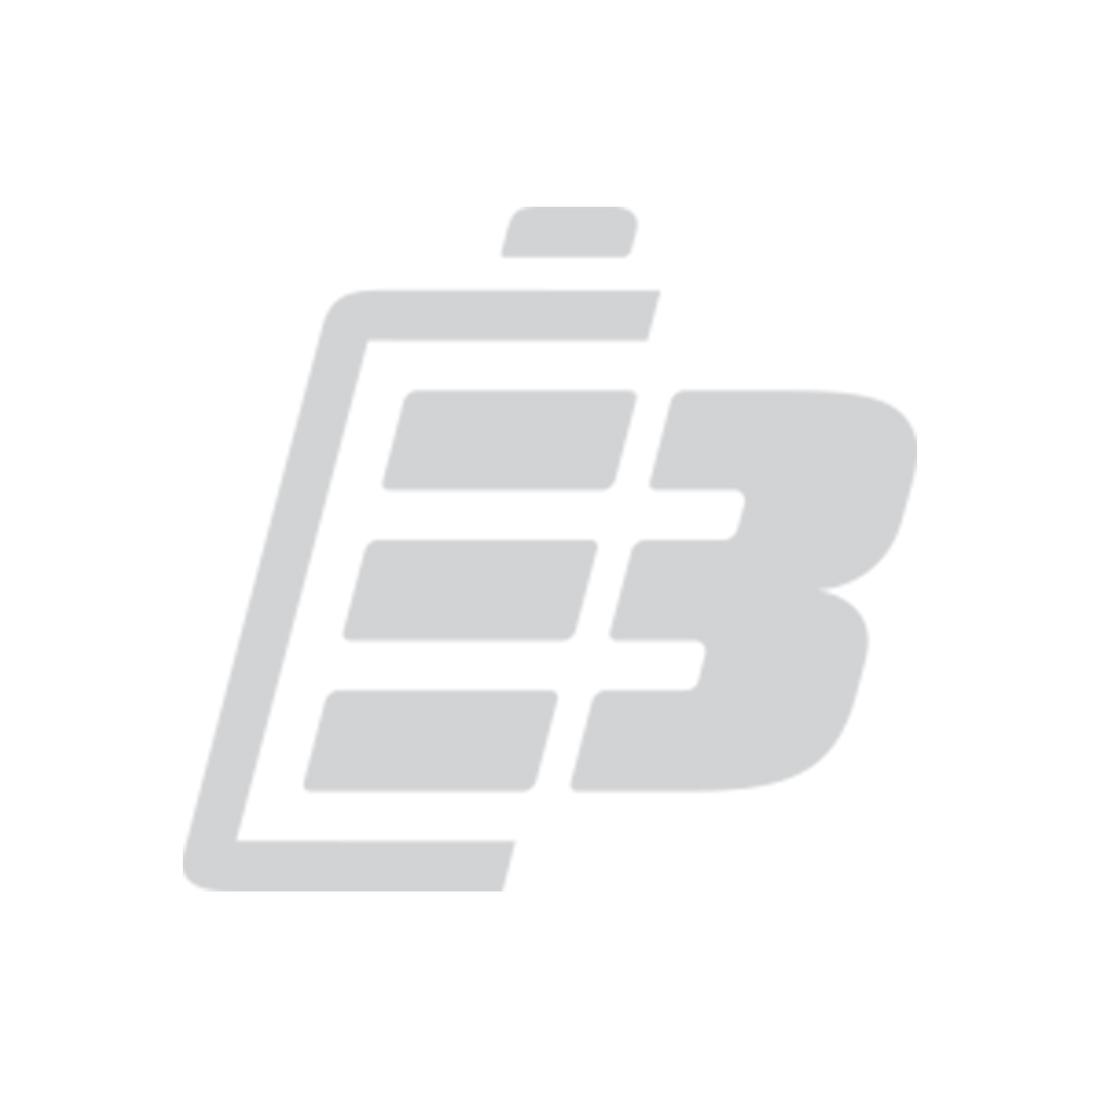 Laptop battery Toshiba Satellite L950_1